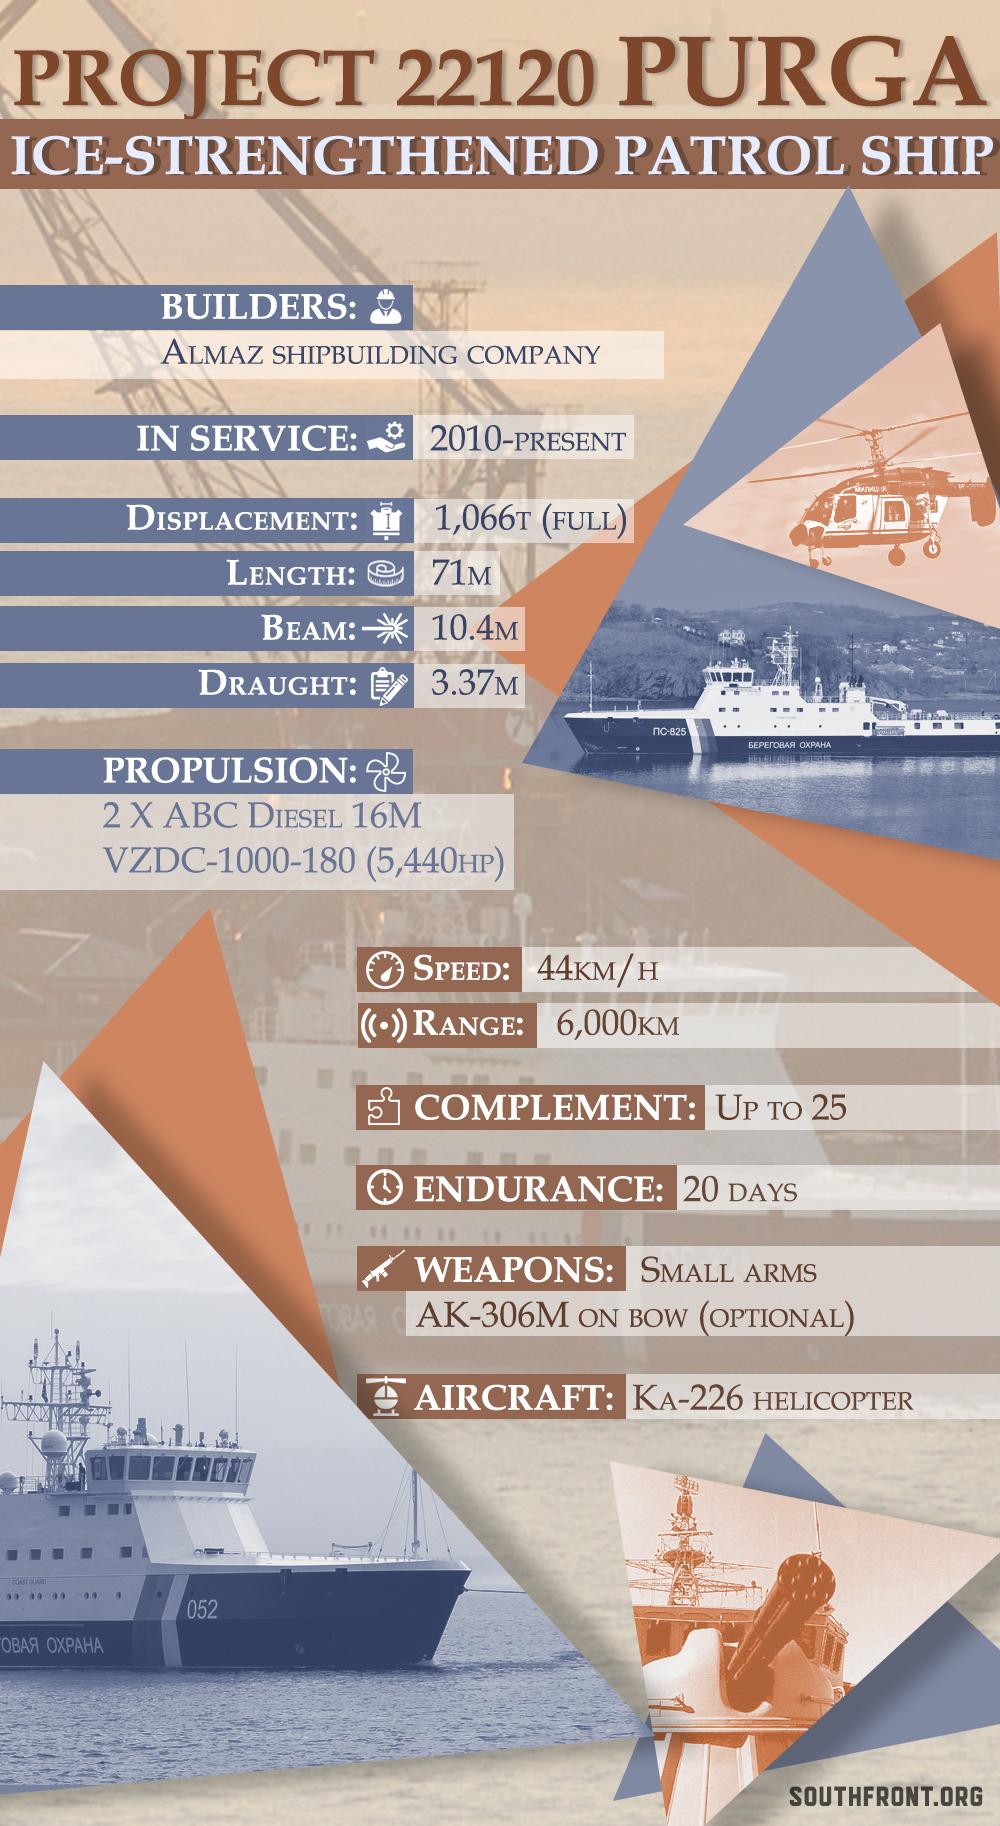 Russia's Project 22120 Purga Patrol Ship (Infographics)